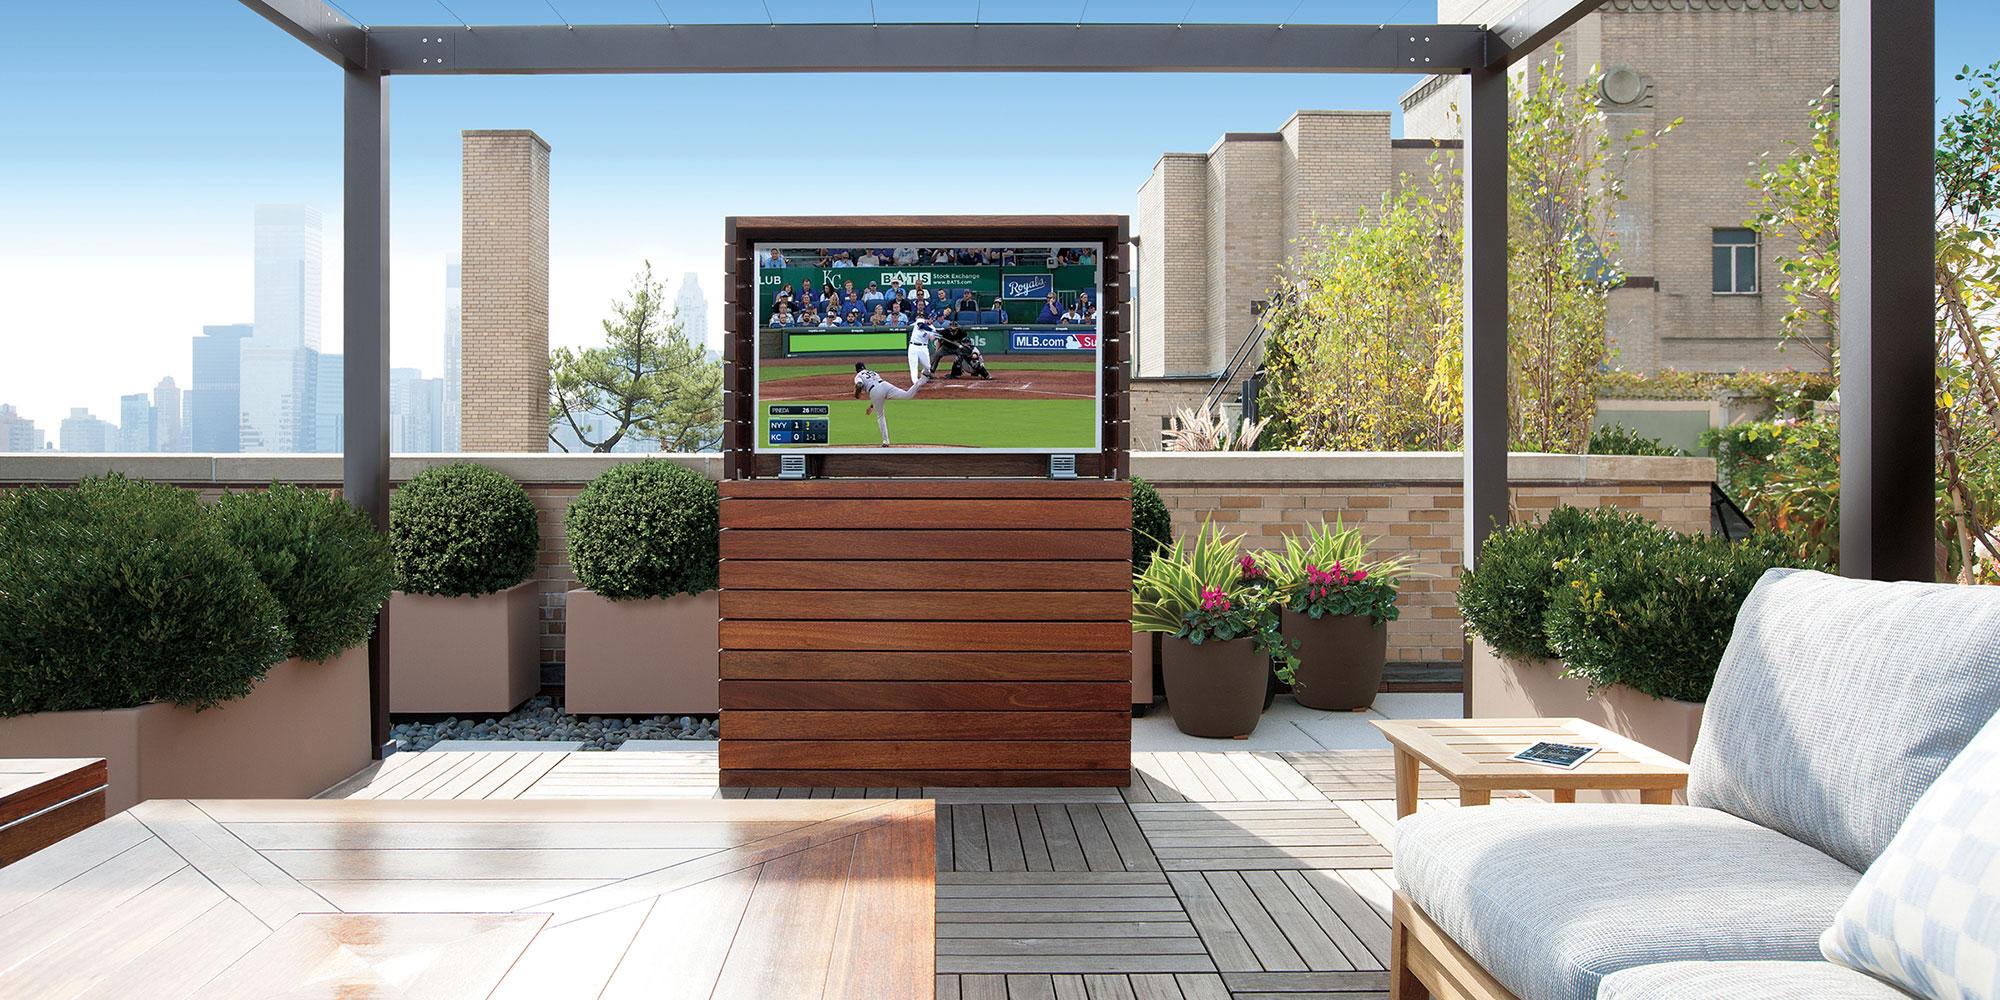 terrace, tv, waterproof tv